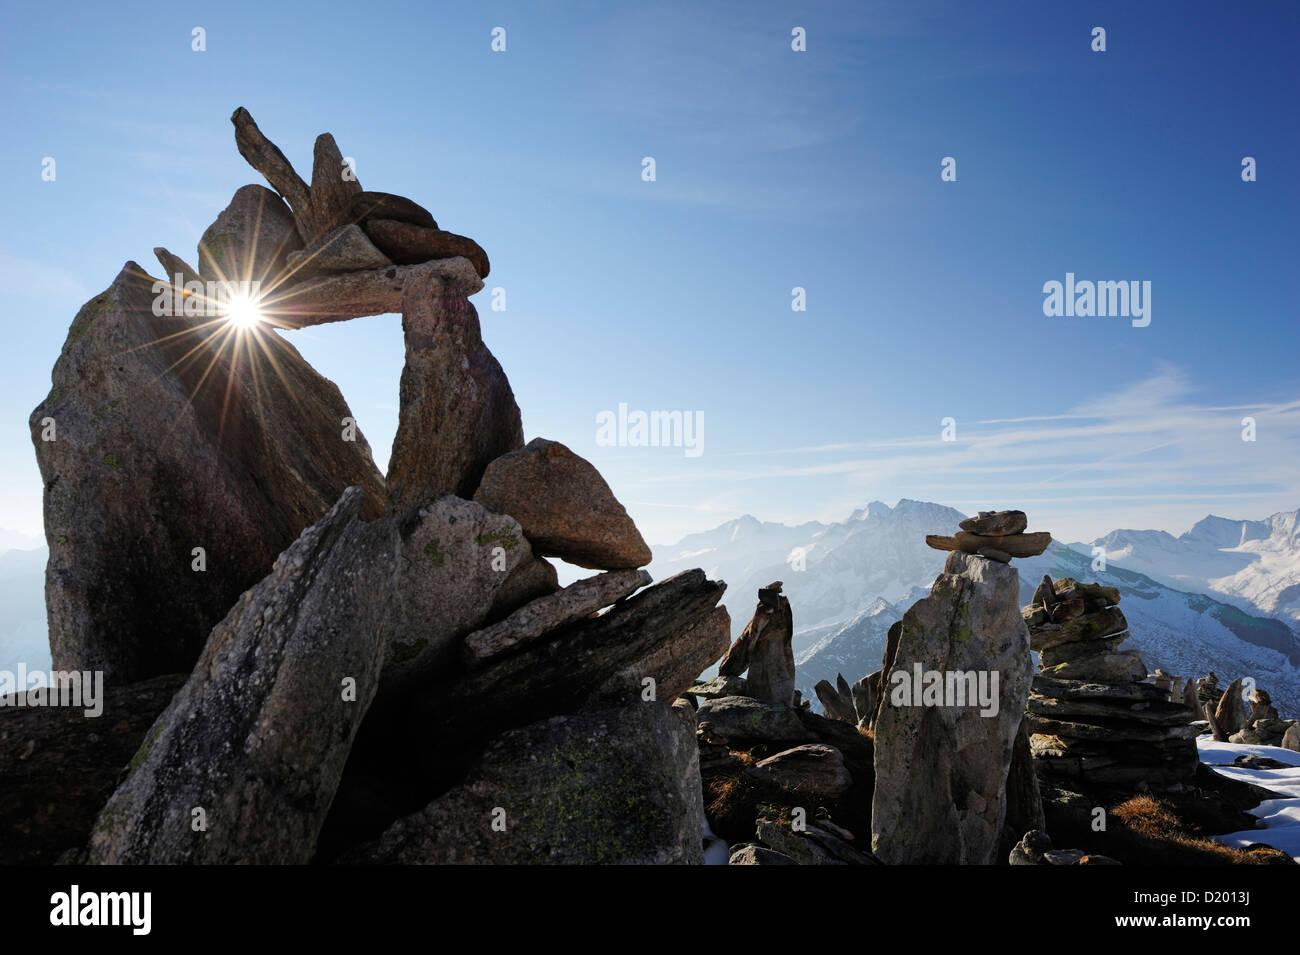 Cairn with sunstar, Zillertal mountain range, Zillertal, Tyrol, Austria - Stock Image